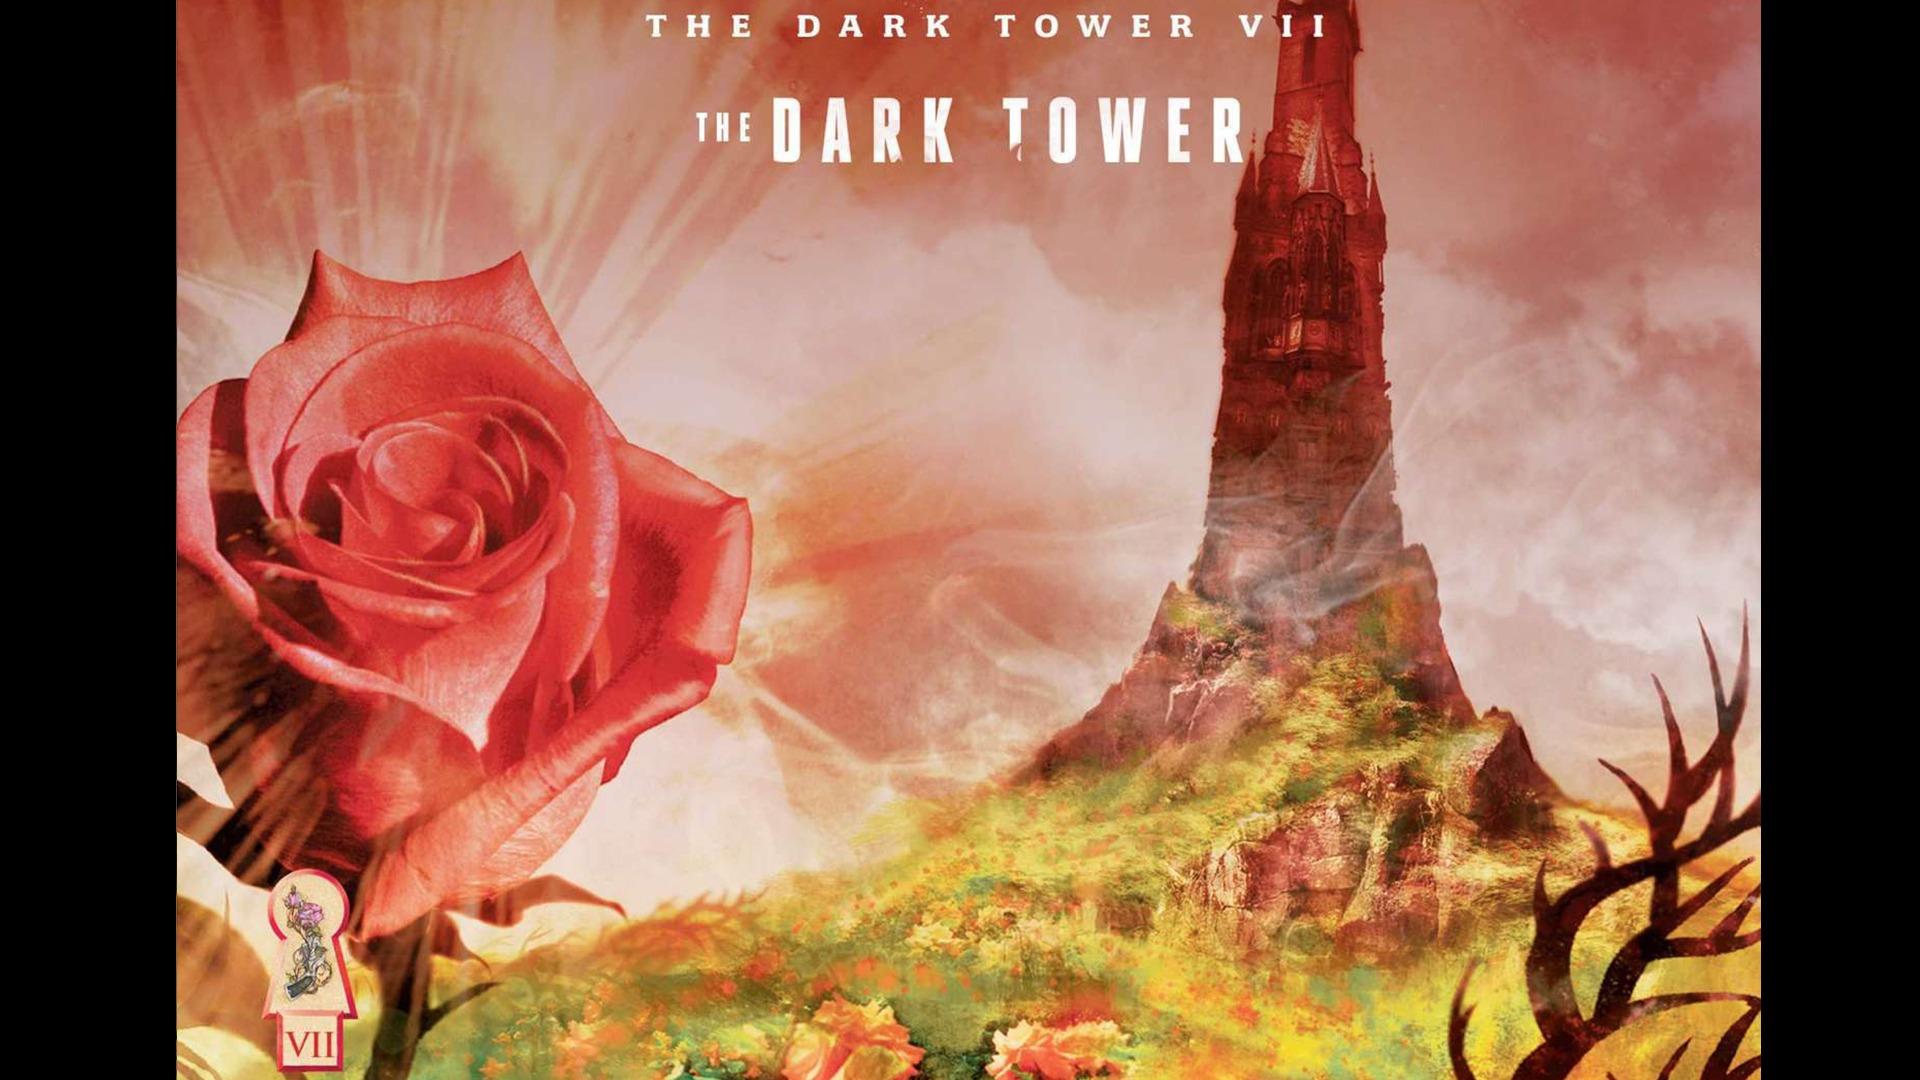 The Dark Tower Stephen King Dark Tower 7 1422938 Hd Wallpaper Backgrounds Download